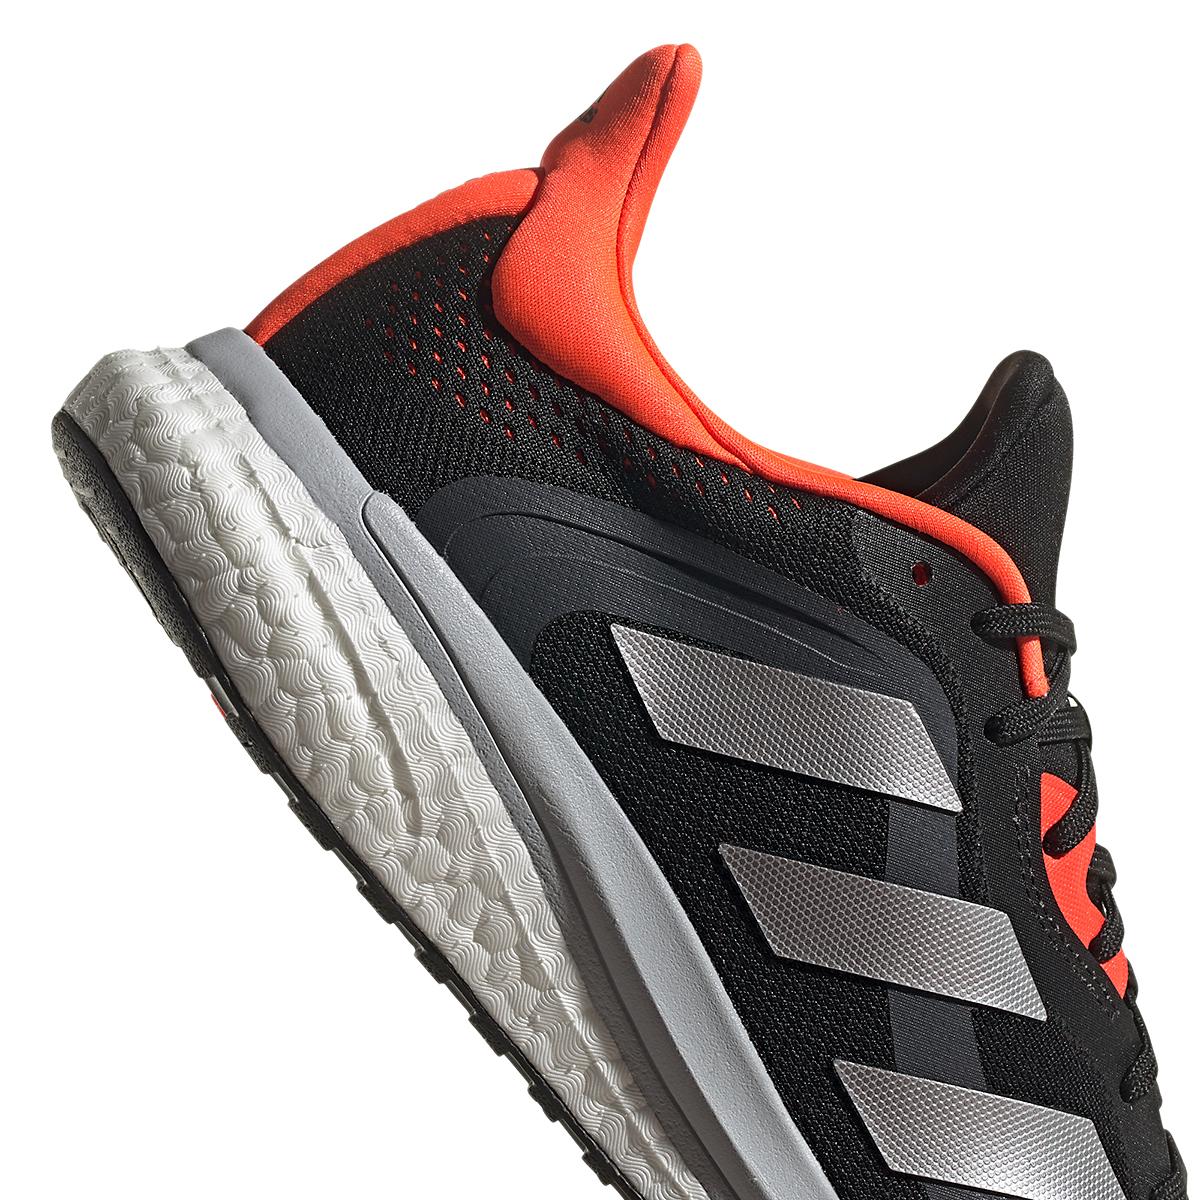 Men's Adidas Solar Glide 4 ST Running Shoe - Color: Core Black/Grey/Solar Red - Size: 6.5 - Width: Regular, Core Black/Grey/Solar Red, large, image 5